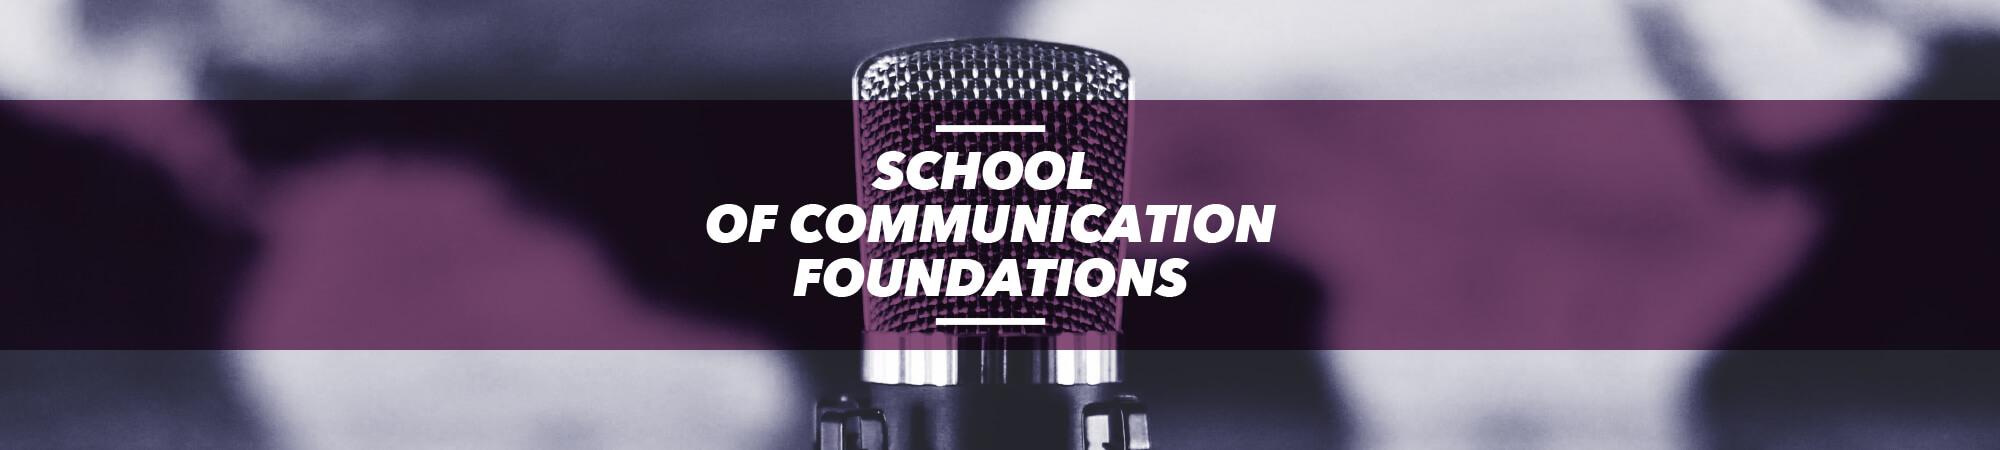 School of Communication Foundations YWAM Worcester